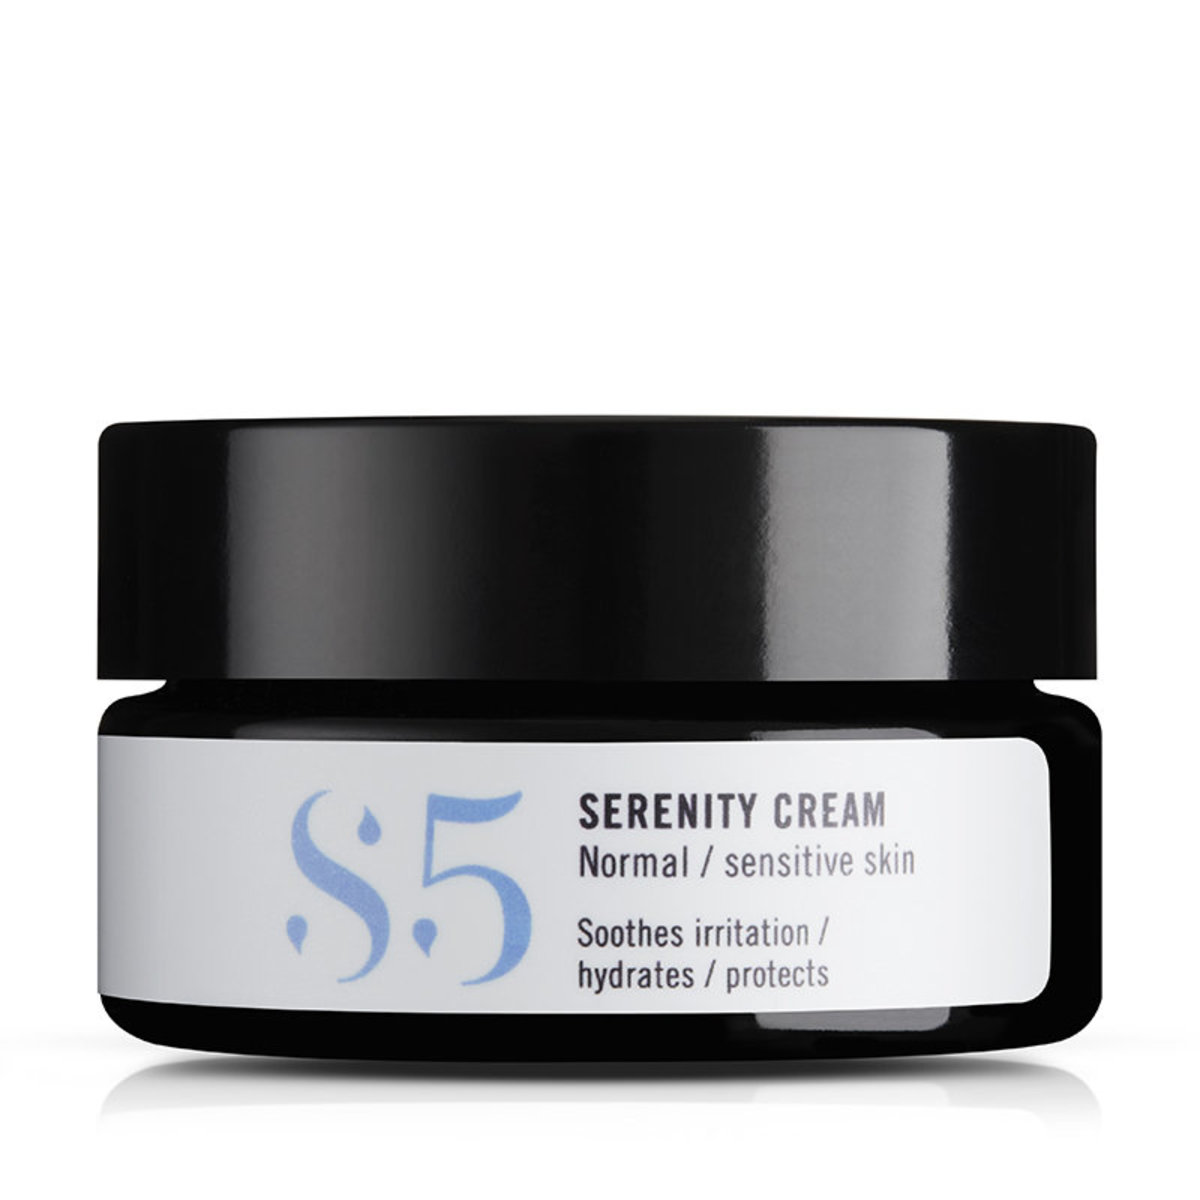 Serenity Cream